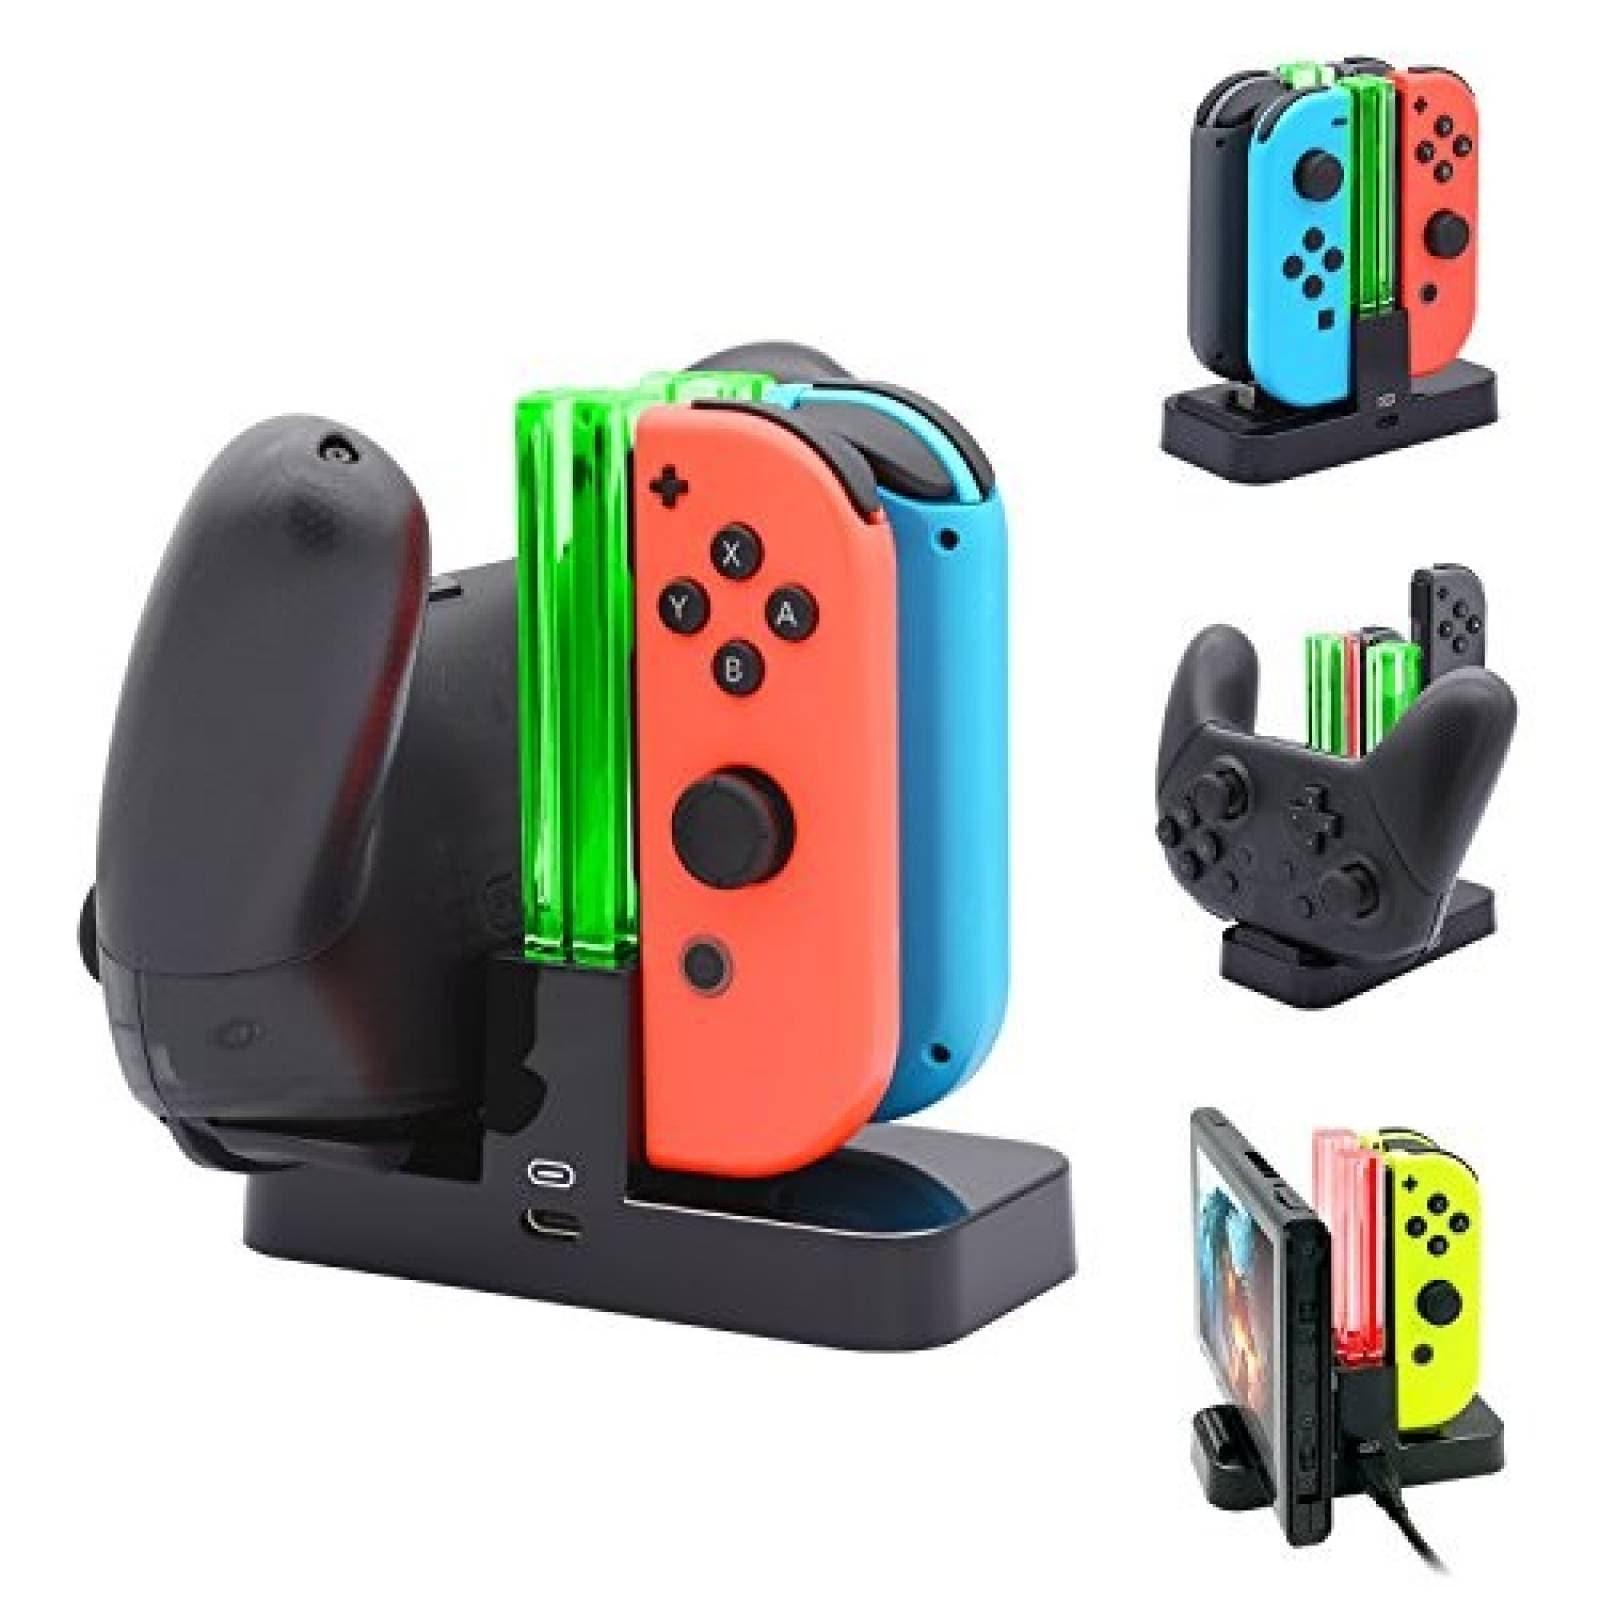 Cargador para control remoto FASTSNAIL Nintendo Switch